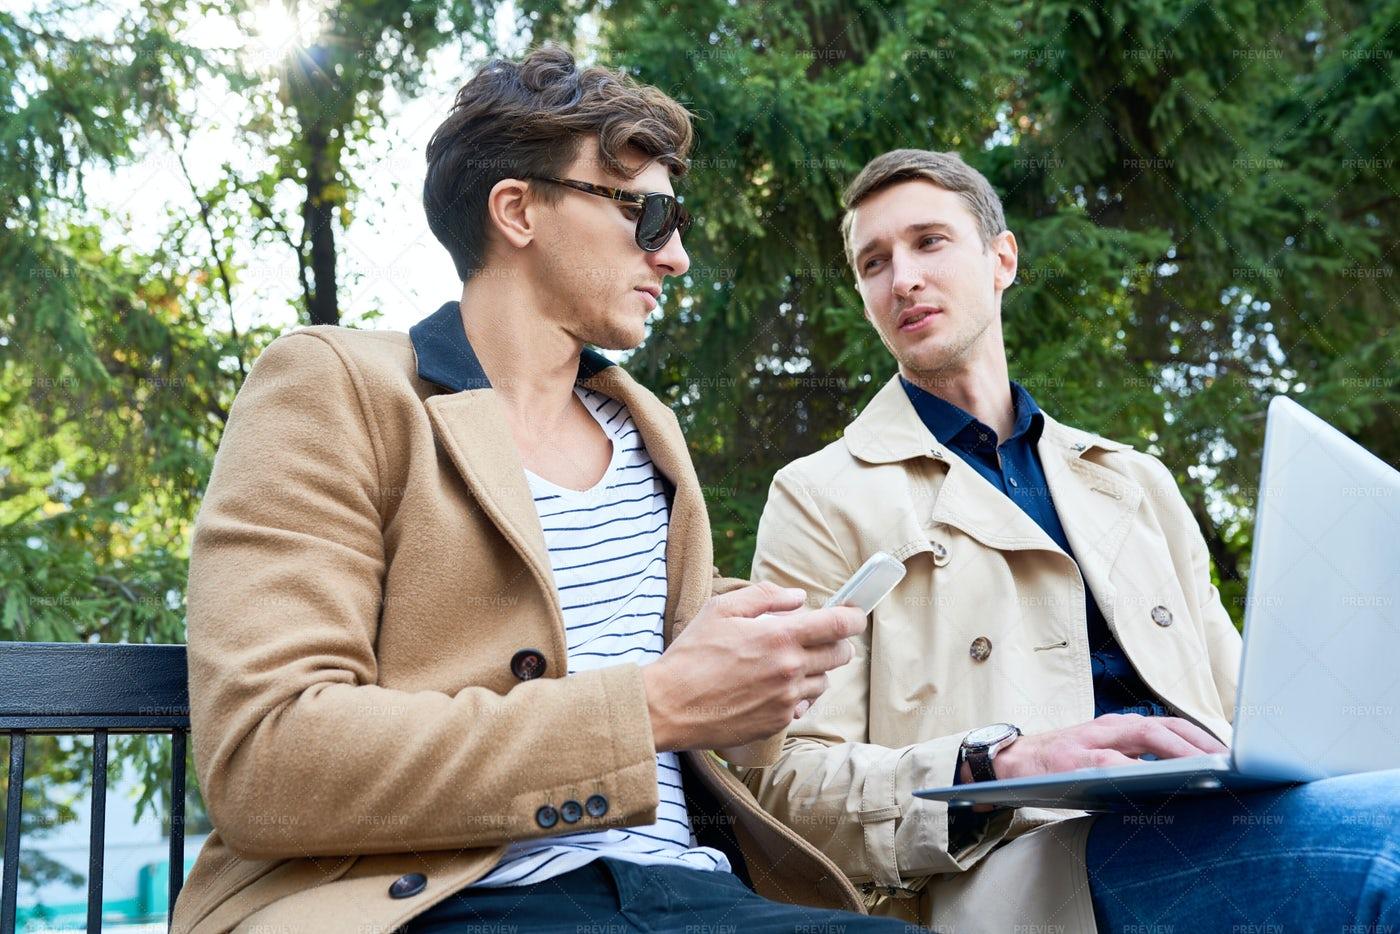 Young Entrepreneurs Discussing Work...: Stock Photos